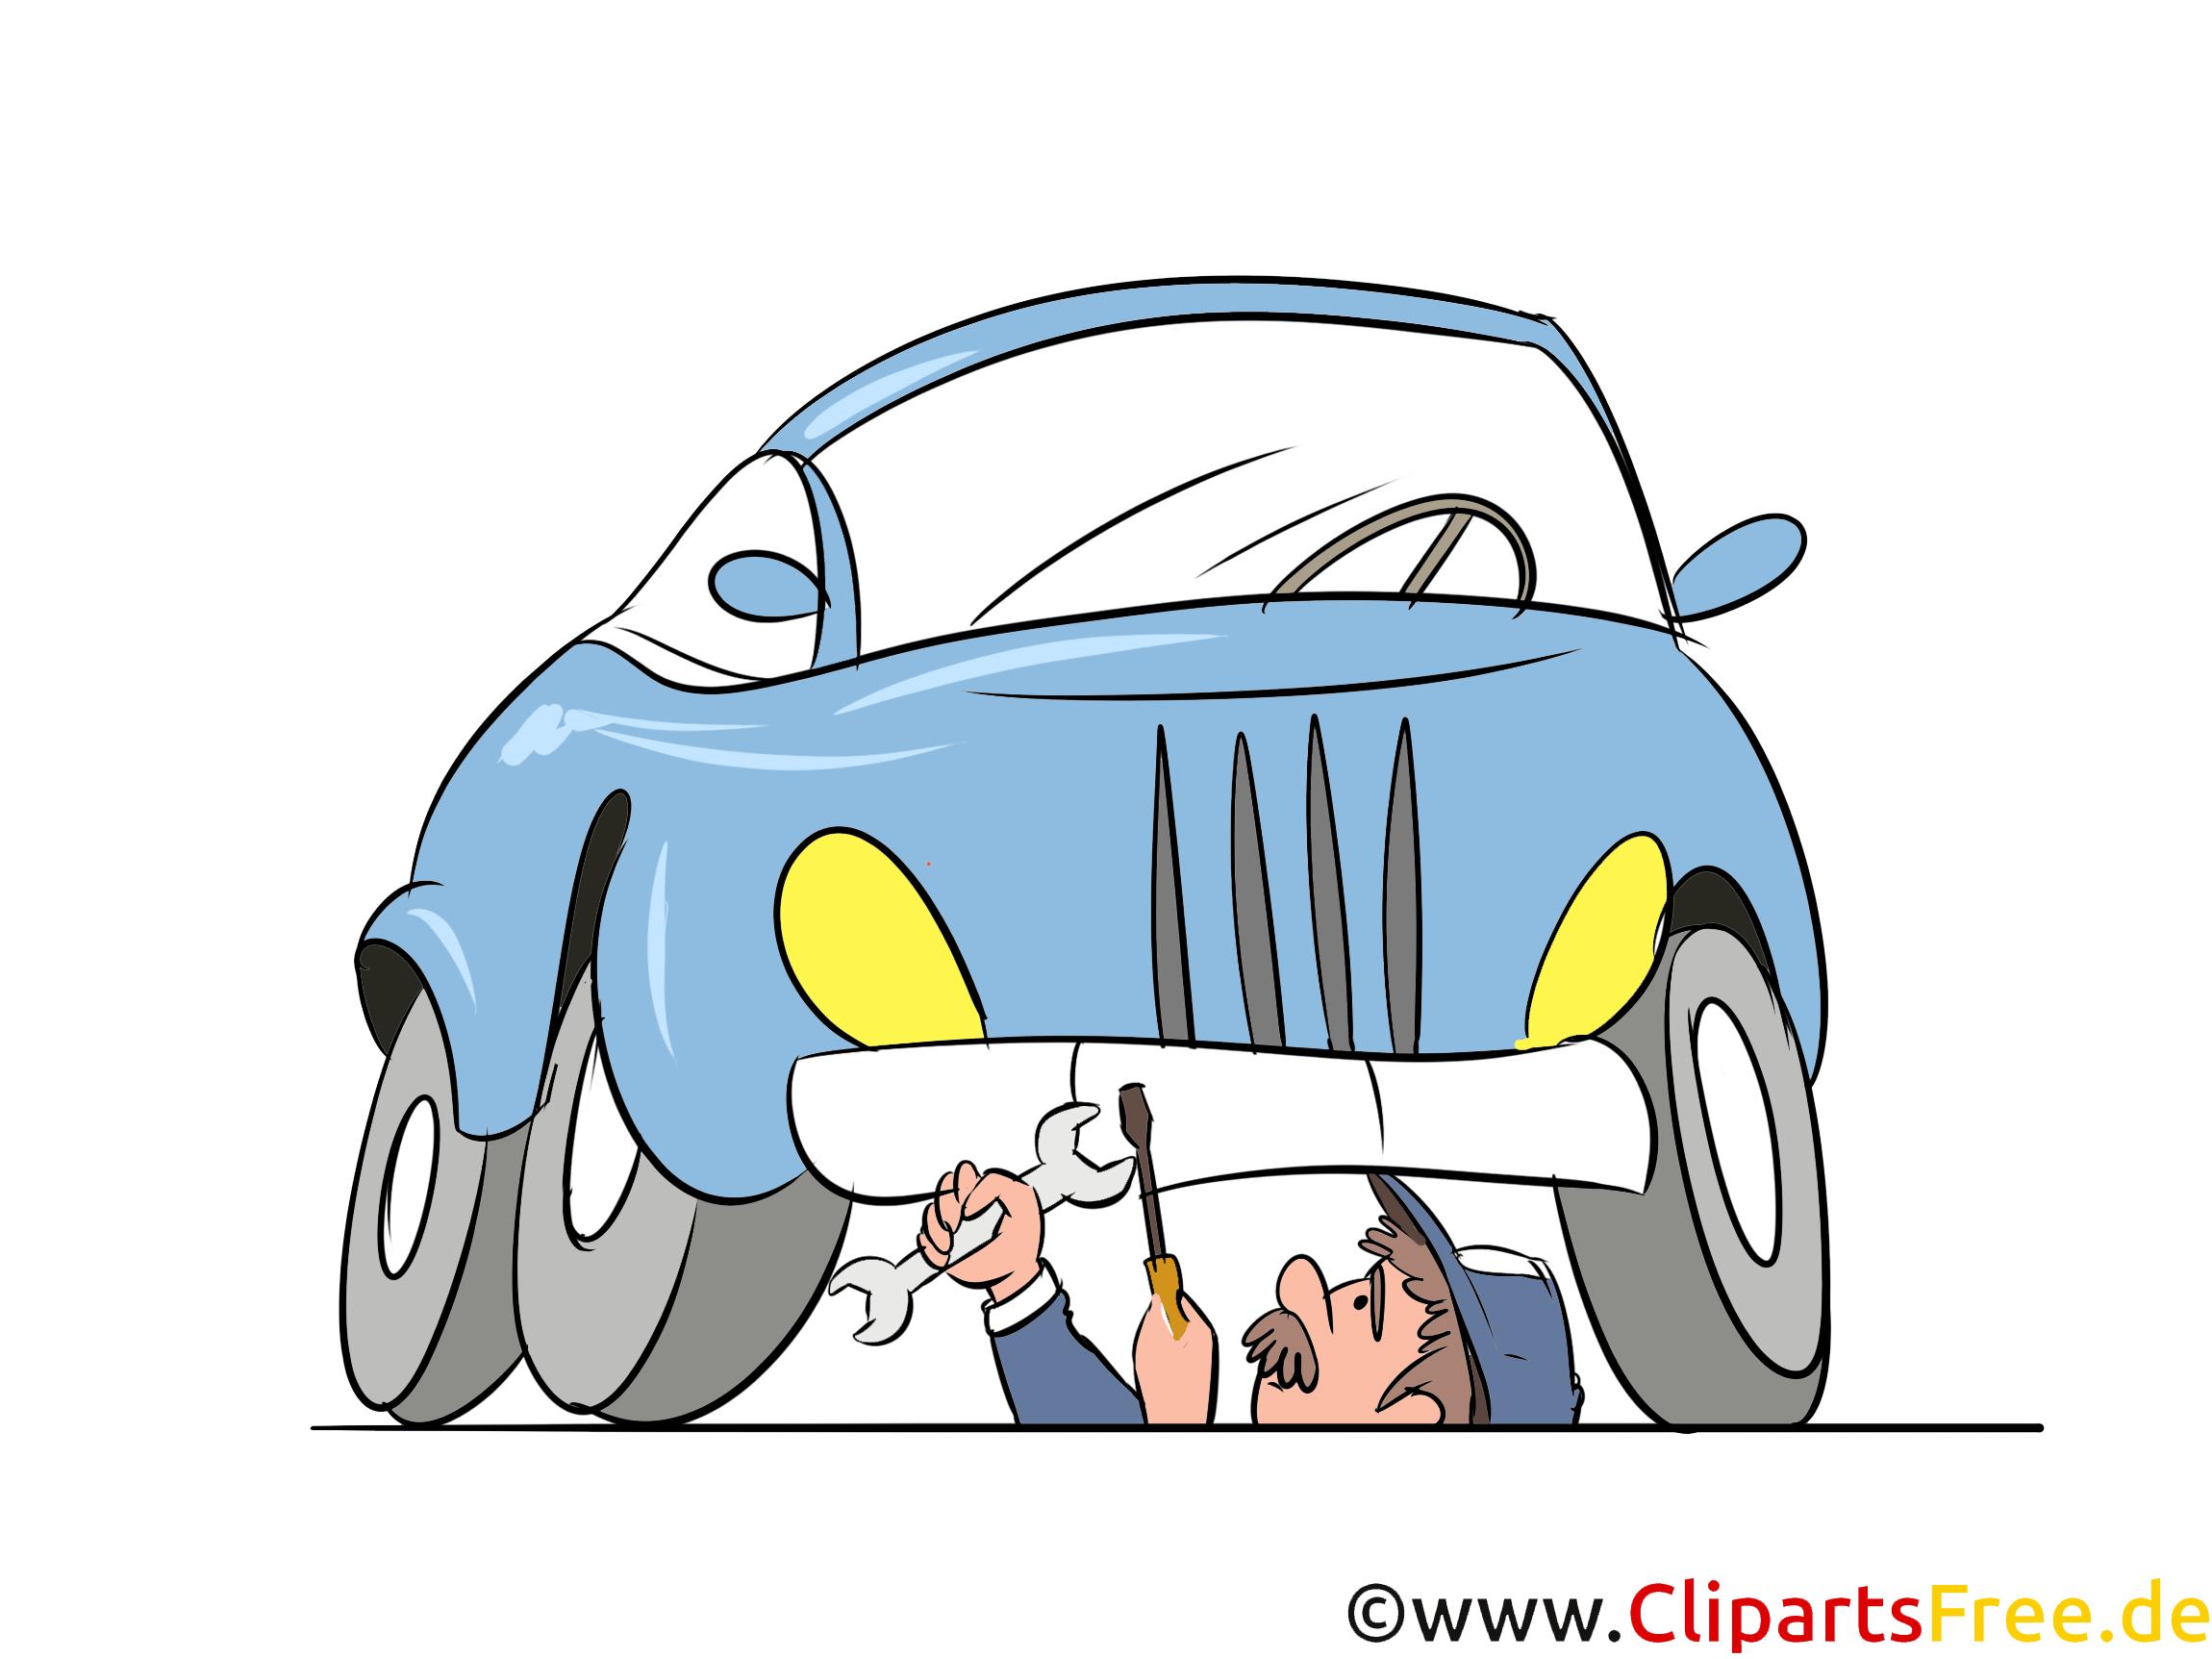 Kfz-Reparatur, Autowerkstatt Bild, Illustration, Clipart, Cartoon gratis